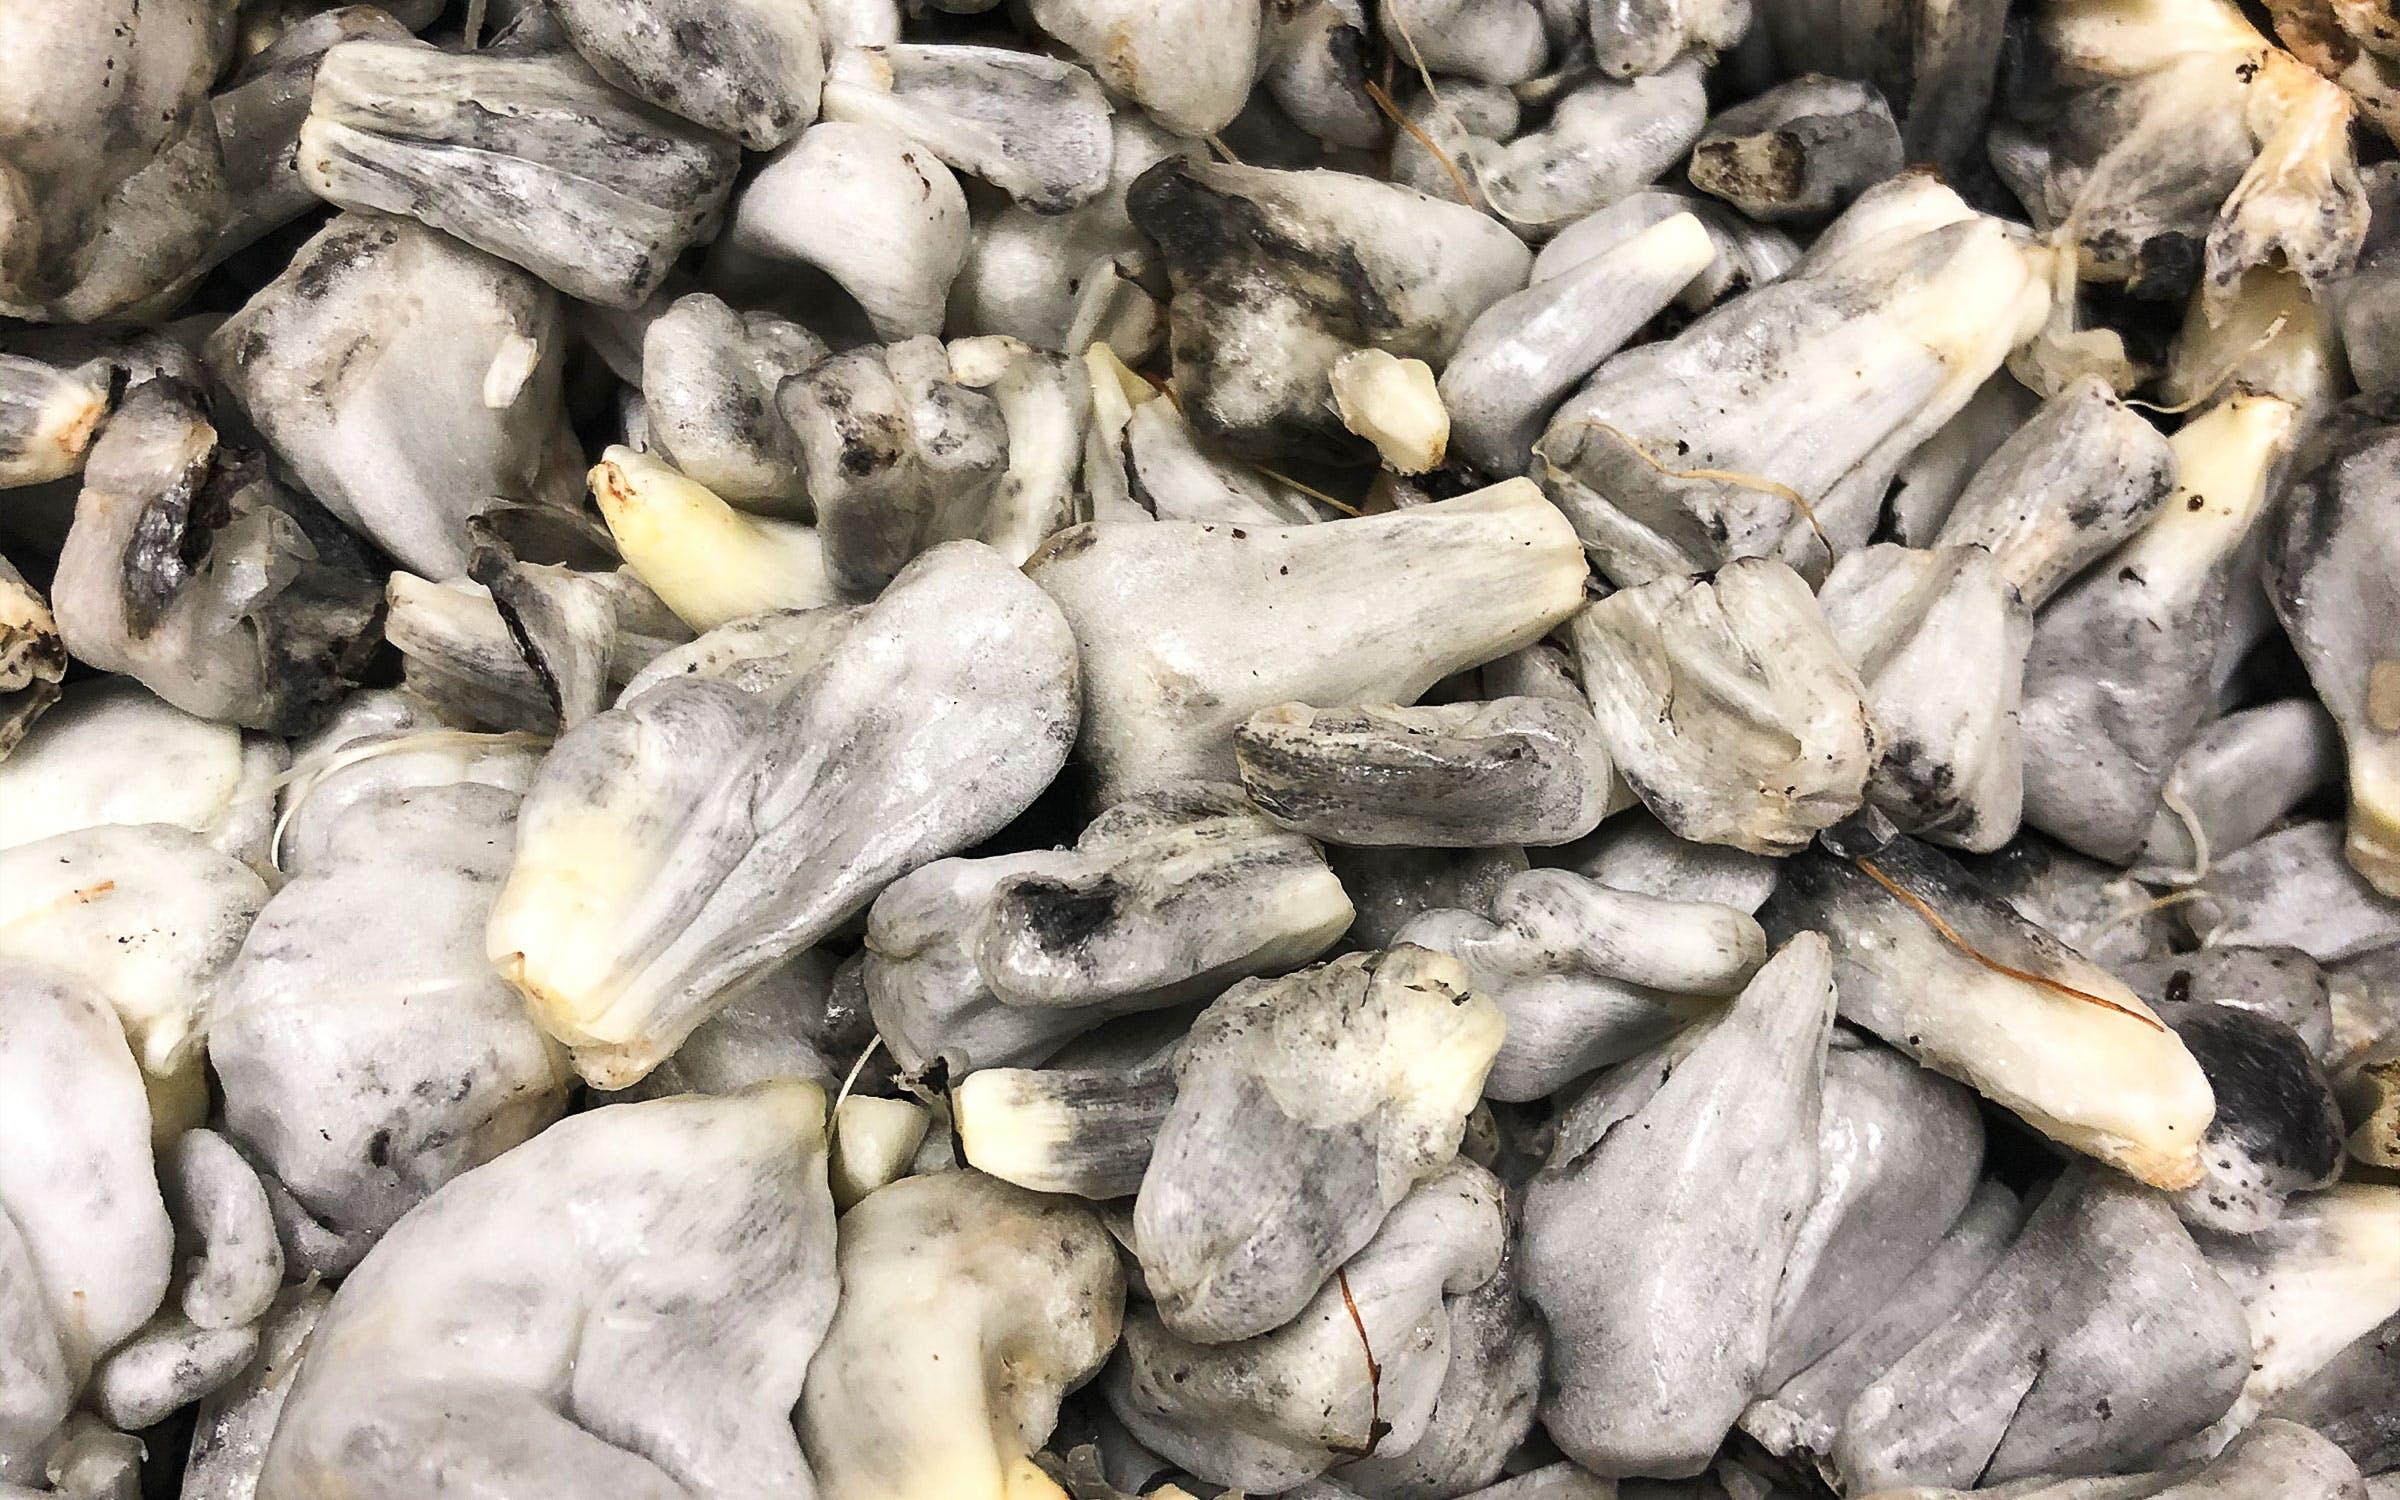 texas-mex-food-texas-huitlacoche-explainer-2